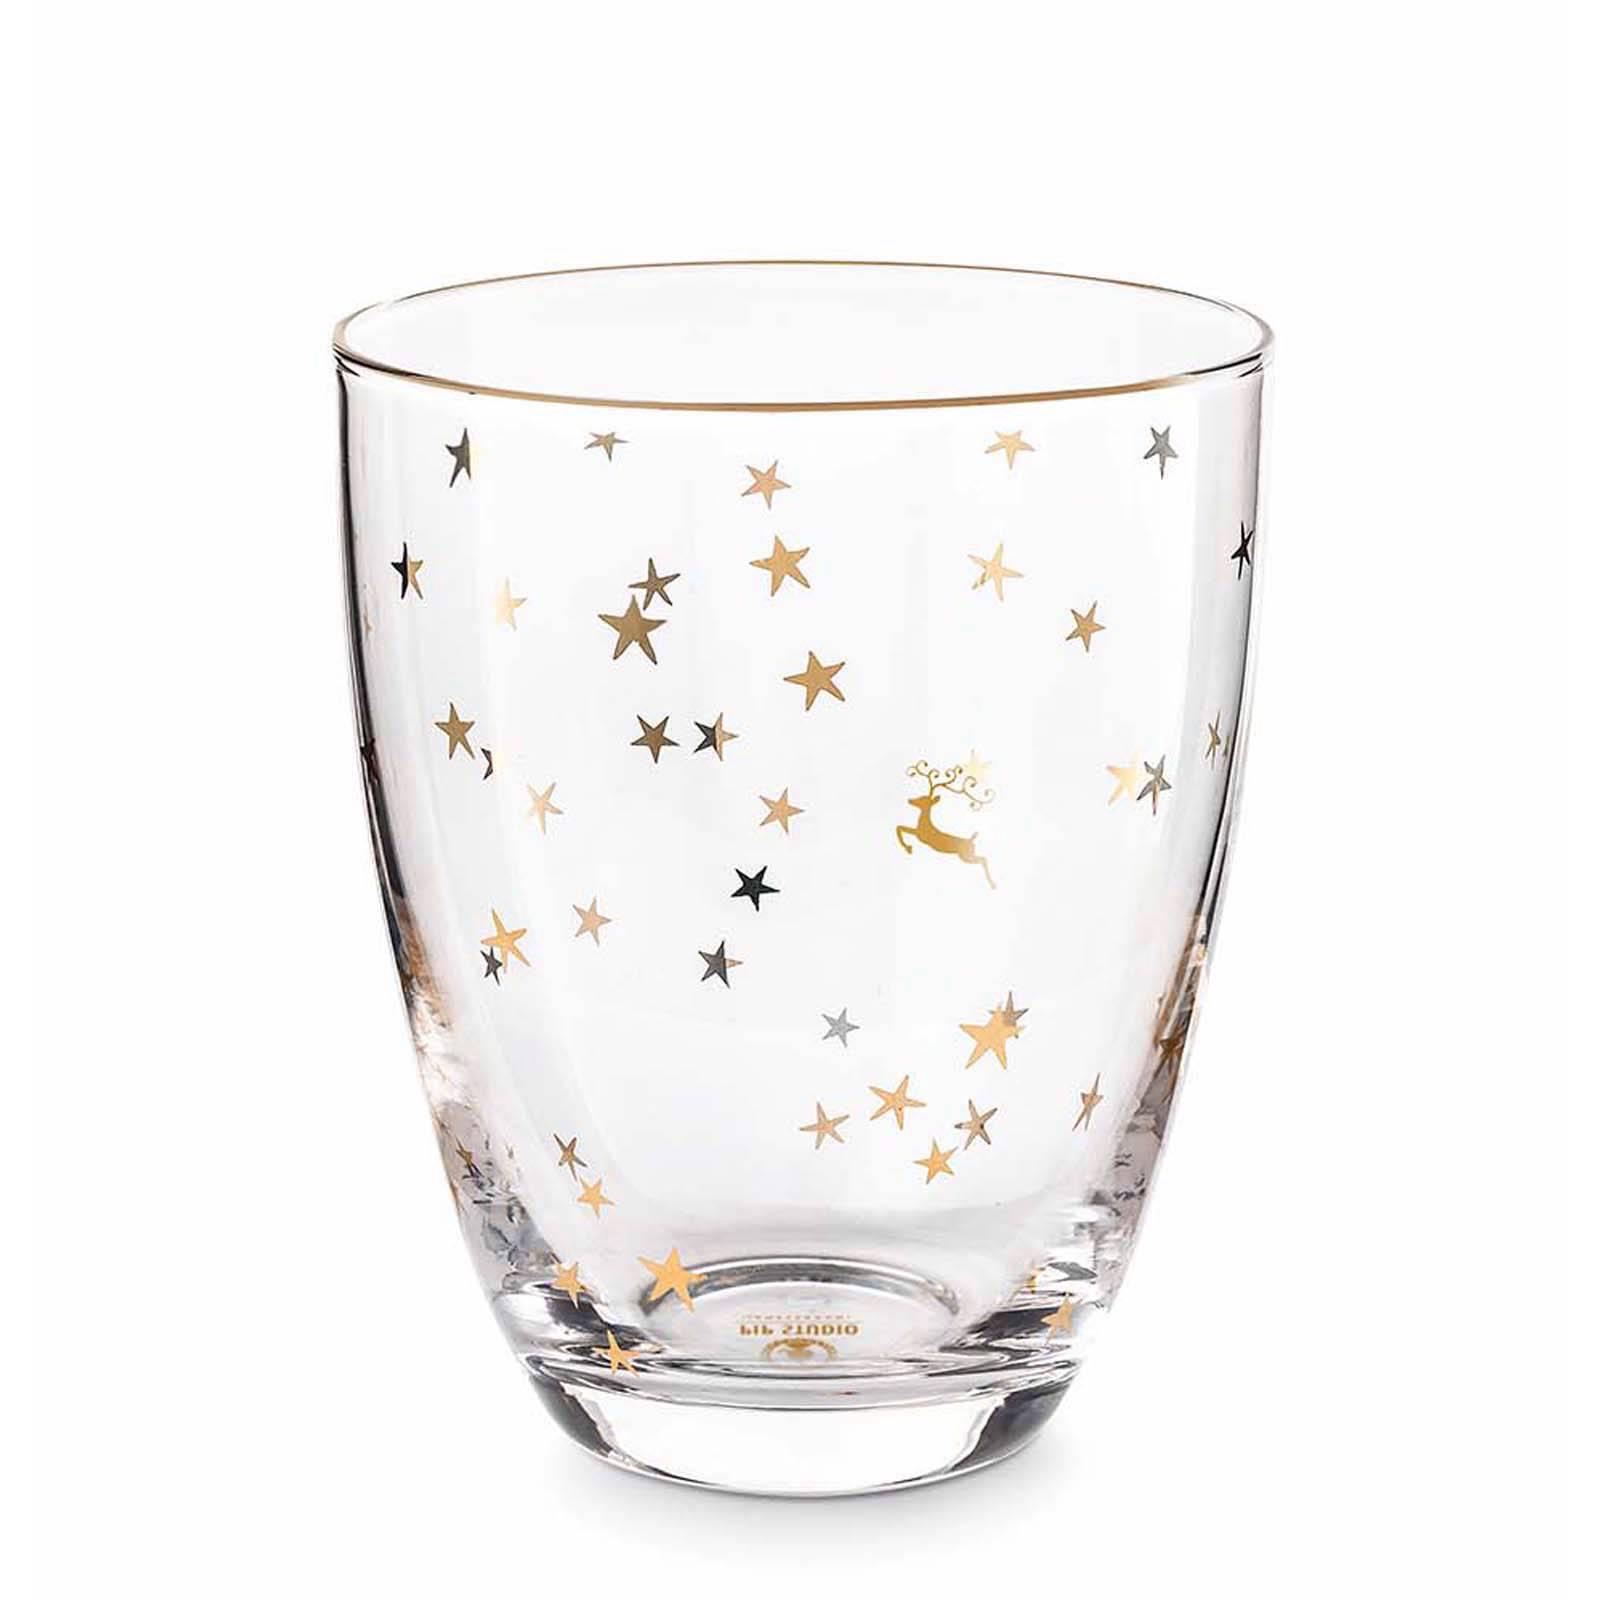 Pip Studio Royal Christmas waterglas (Ø8,9 cm)